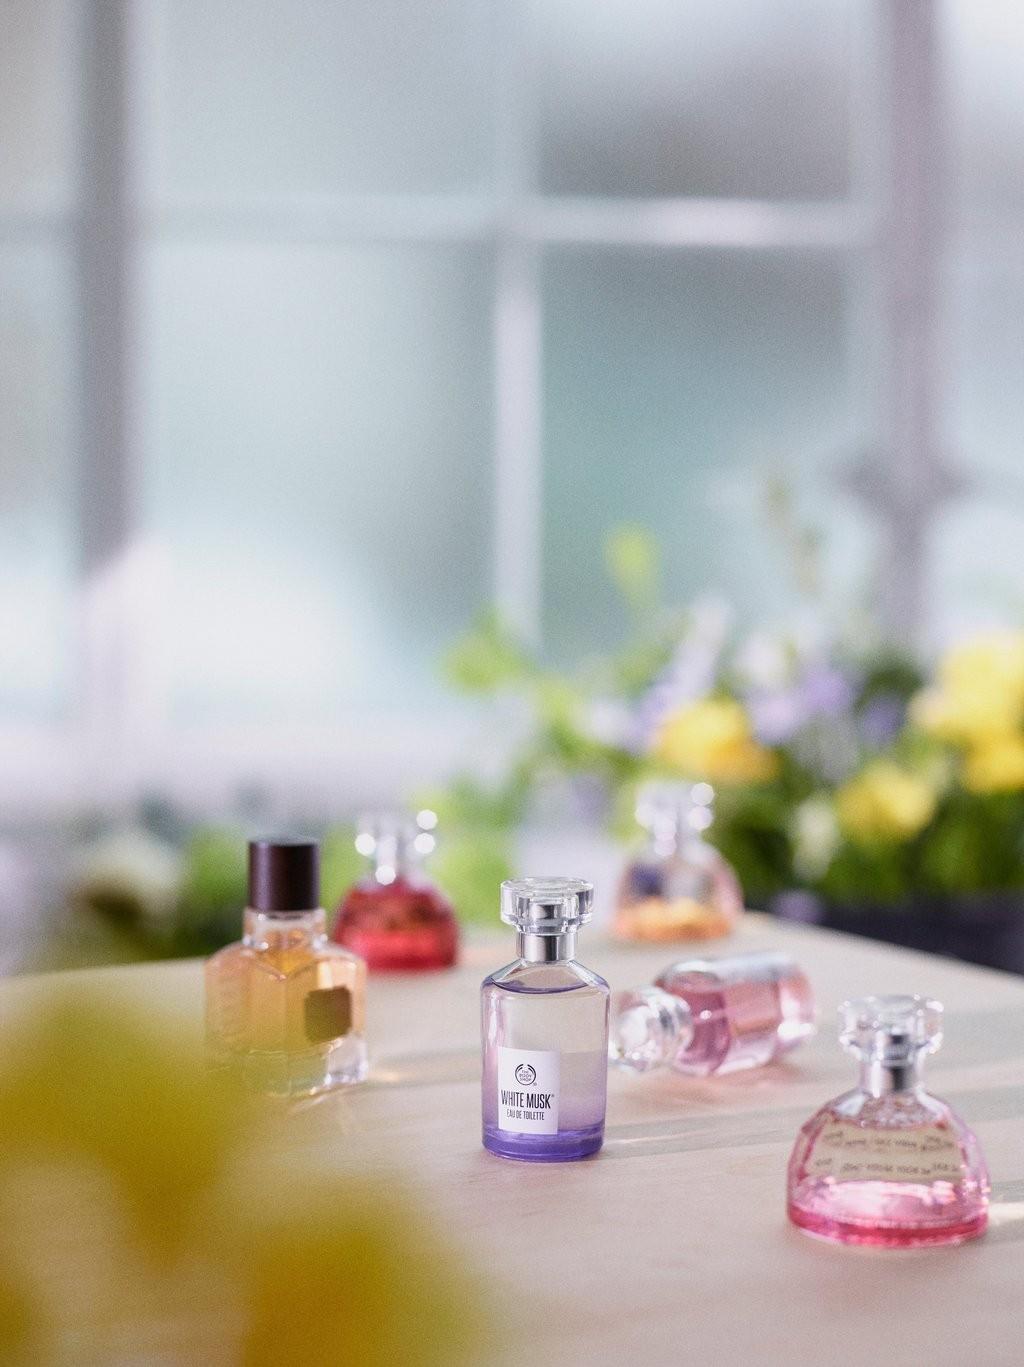 The Body Shop fragrance bottles